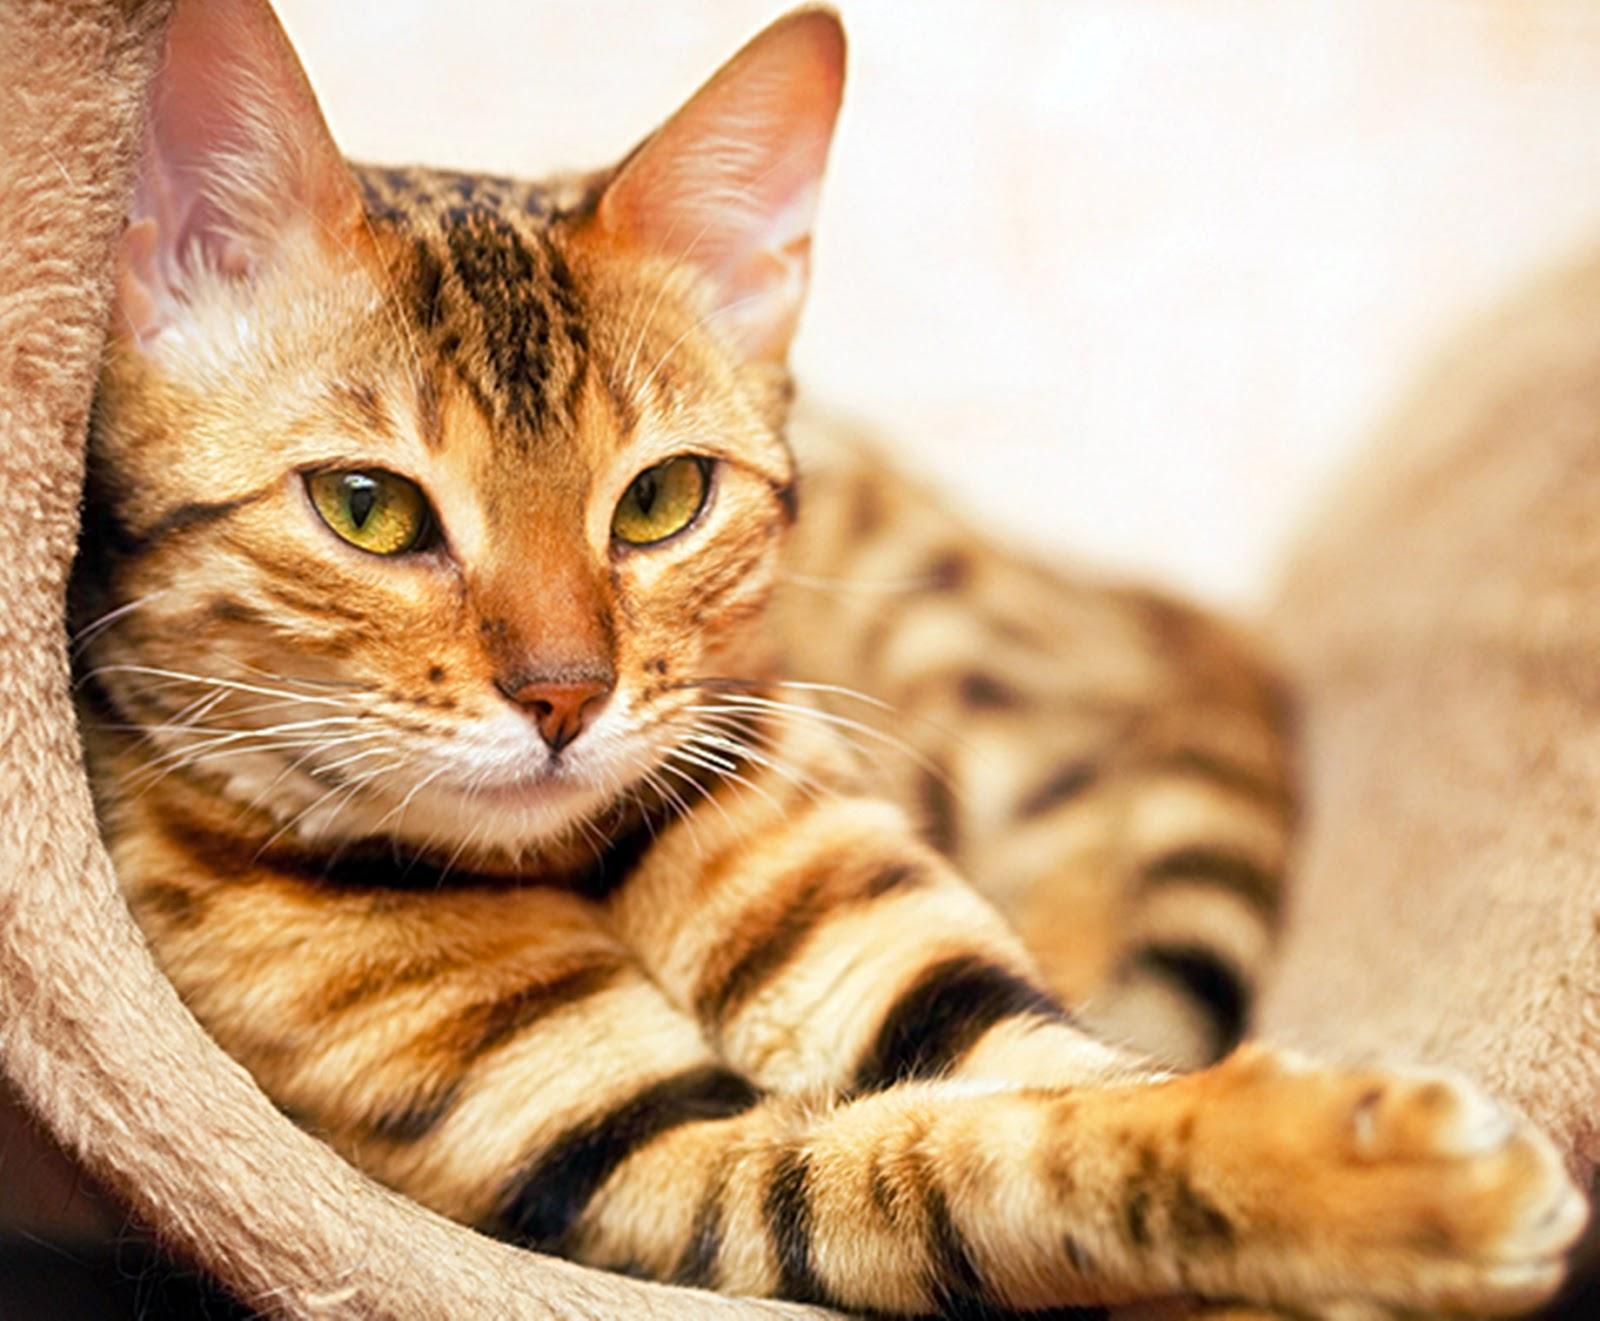 5 Arti Mimpi Kucing Buang Air Menurut Primbon Jawa ...